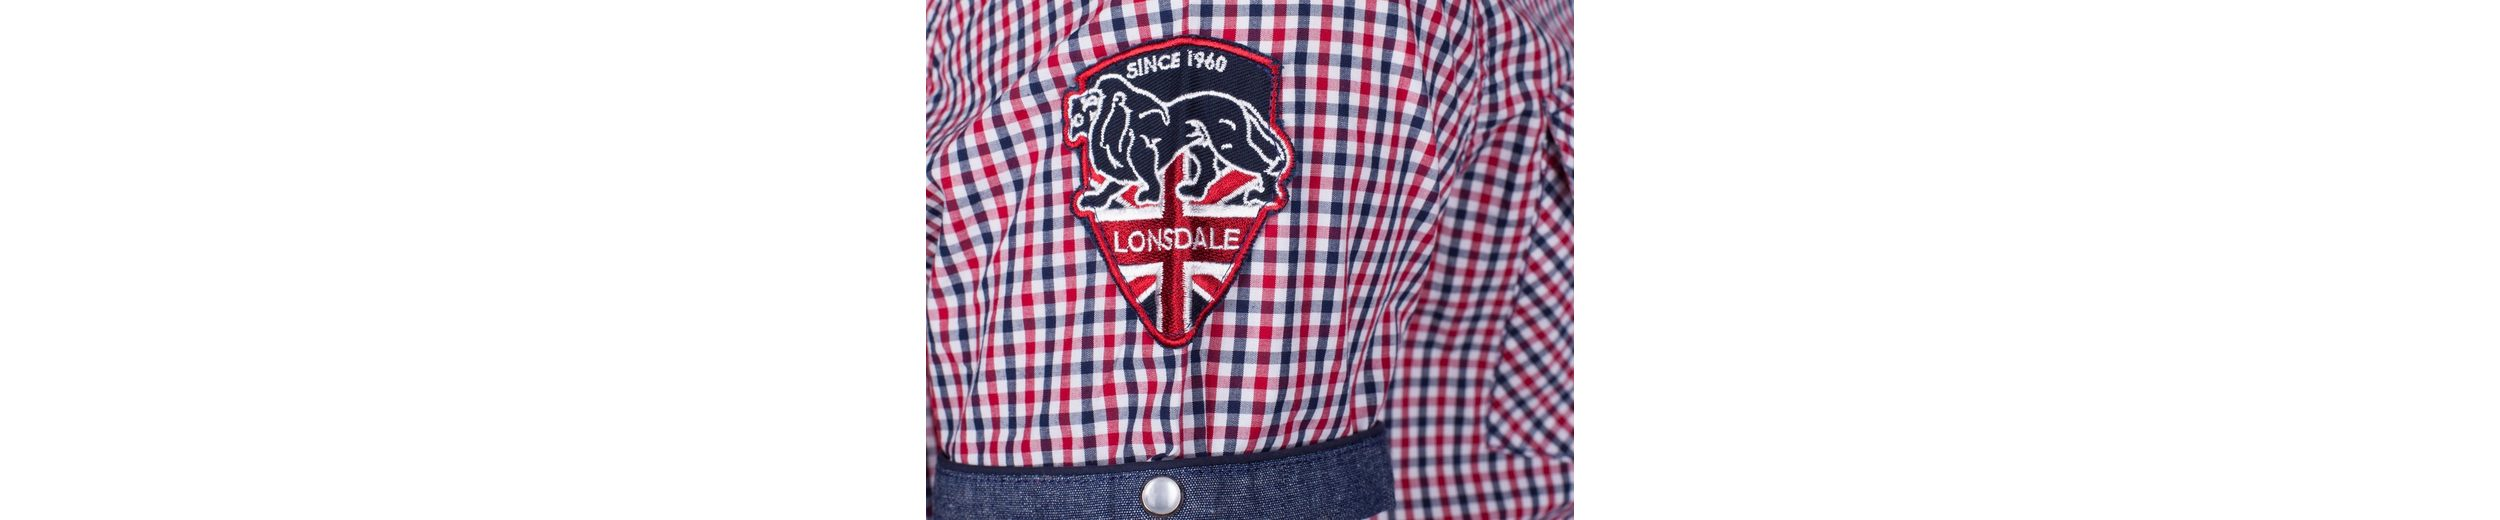 Lonsdale Lonsdale REIGATE Kurzarmhemd REIGATE REIGATE Kurzarmhemd REIGATE Kurzarmhemd Lonsdale Kurzarmhemd Lonsdale rrnw1UBq